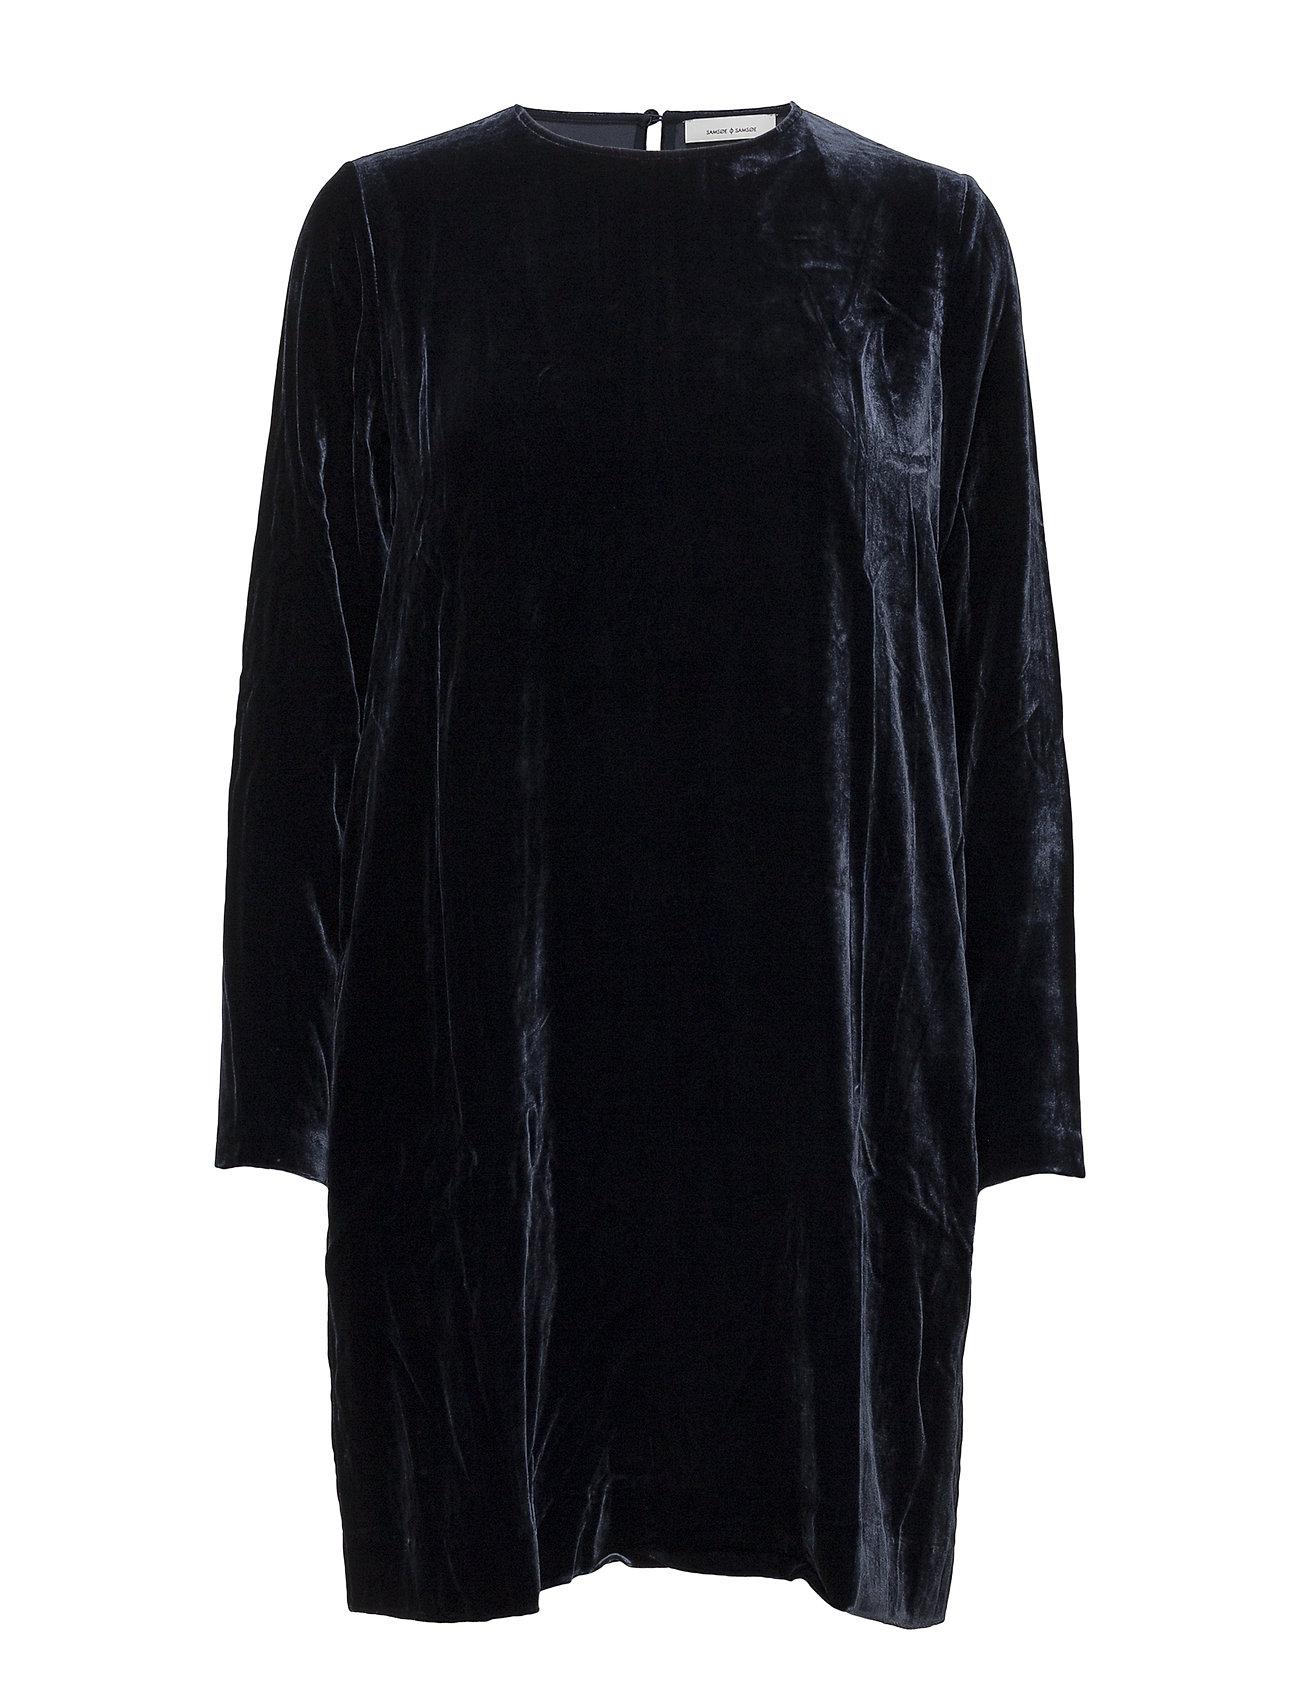 Ls SapphireSamsøeamp; Ls Marice SapphireSamsøeamp; Ls Dress 6627dark Marice Dress Marice 6627dark XnwPN80Ok